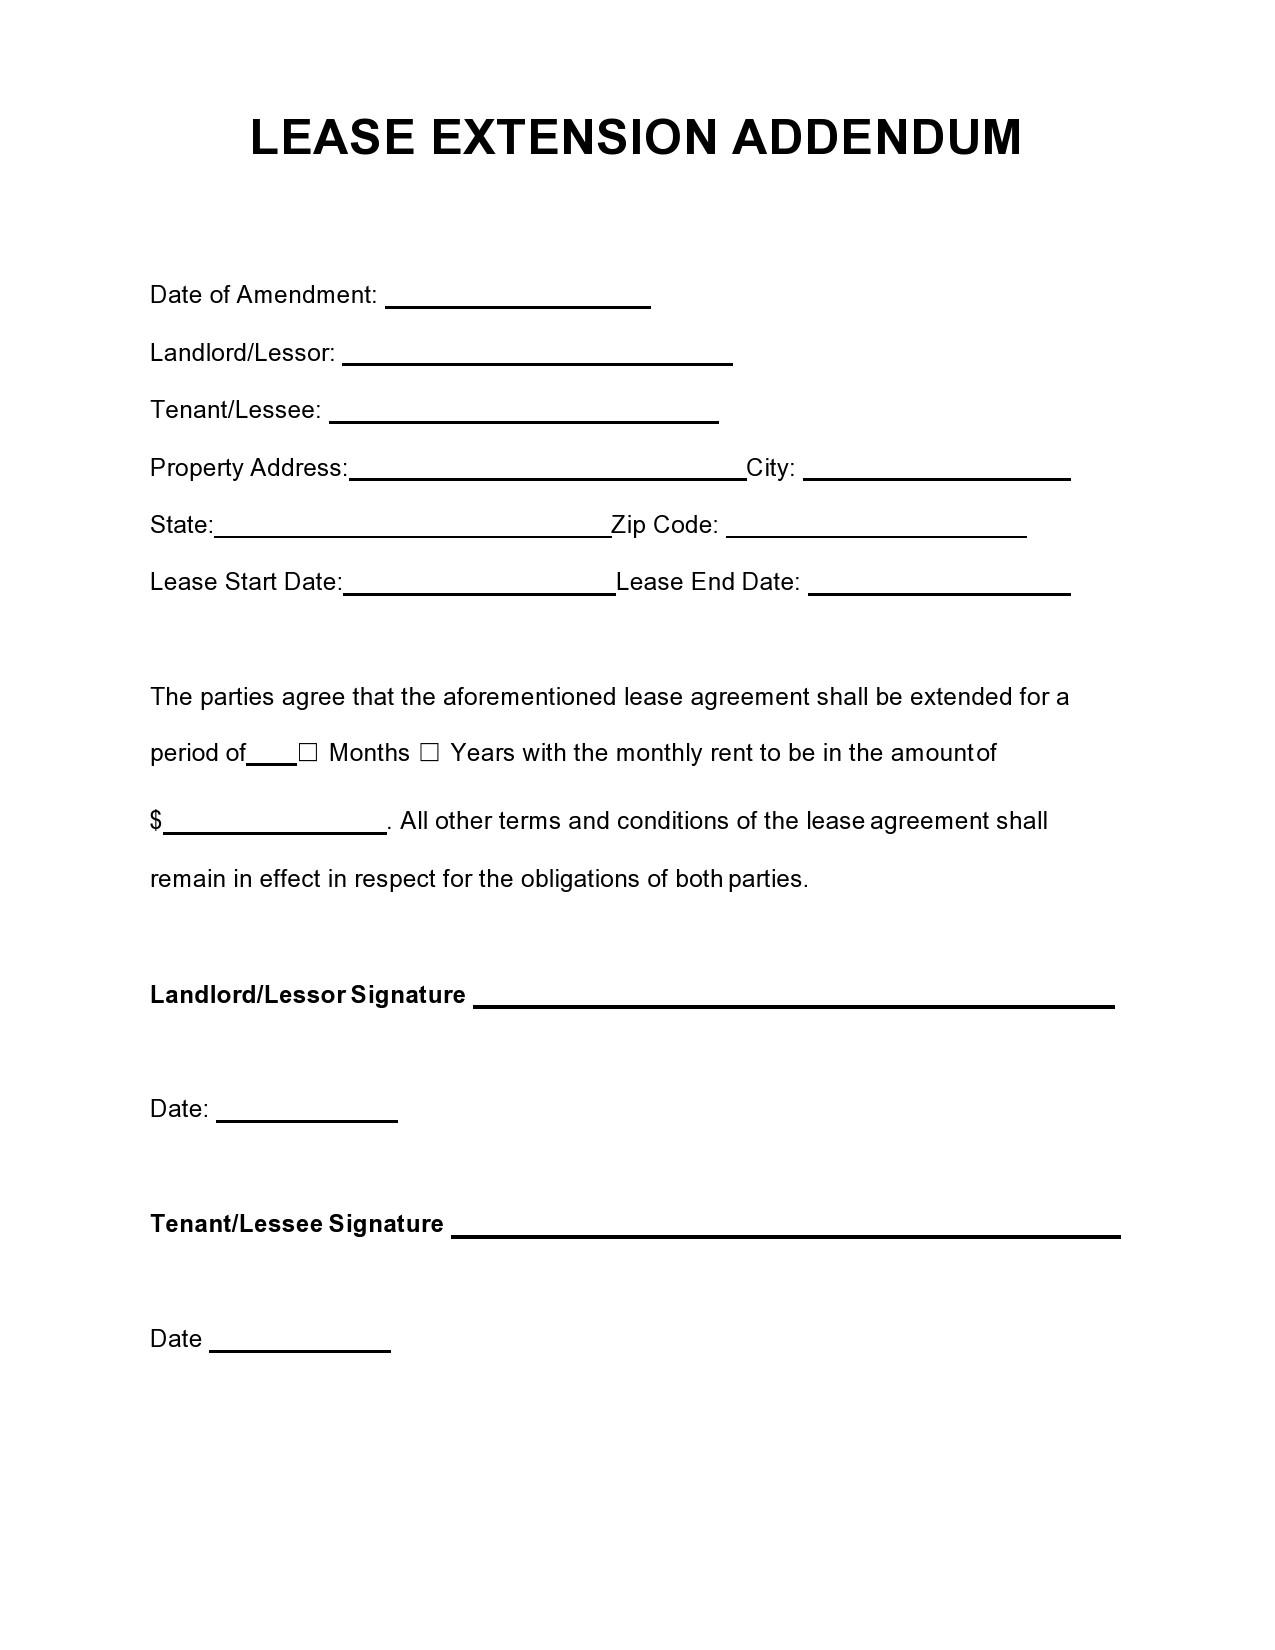 Free lease extension addendum 05